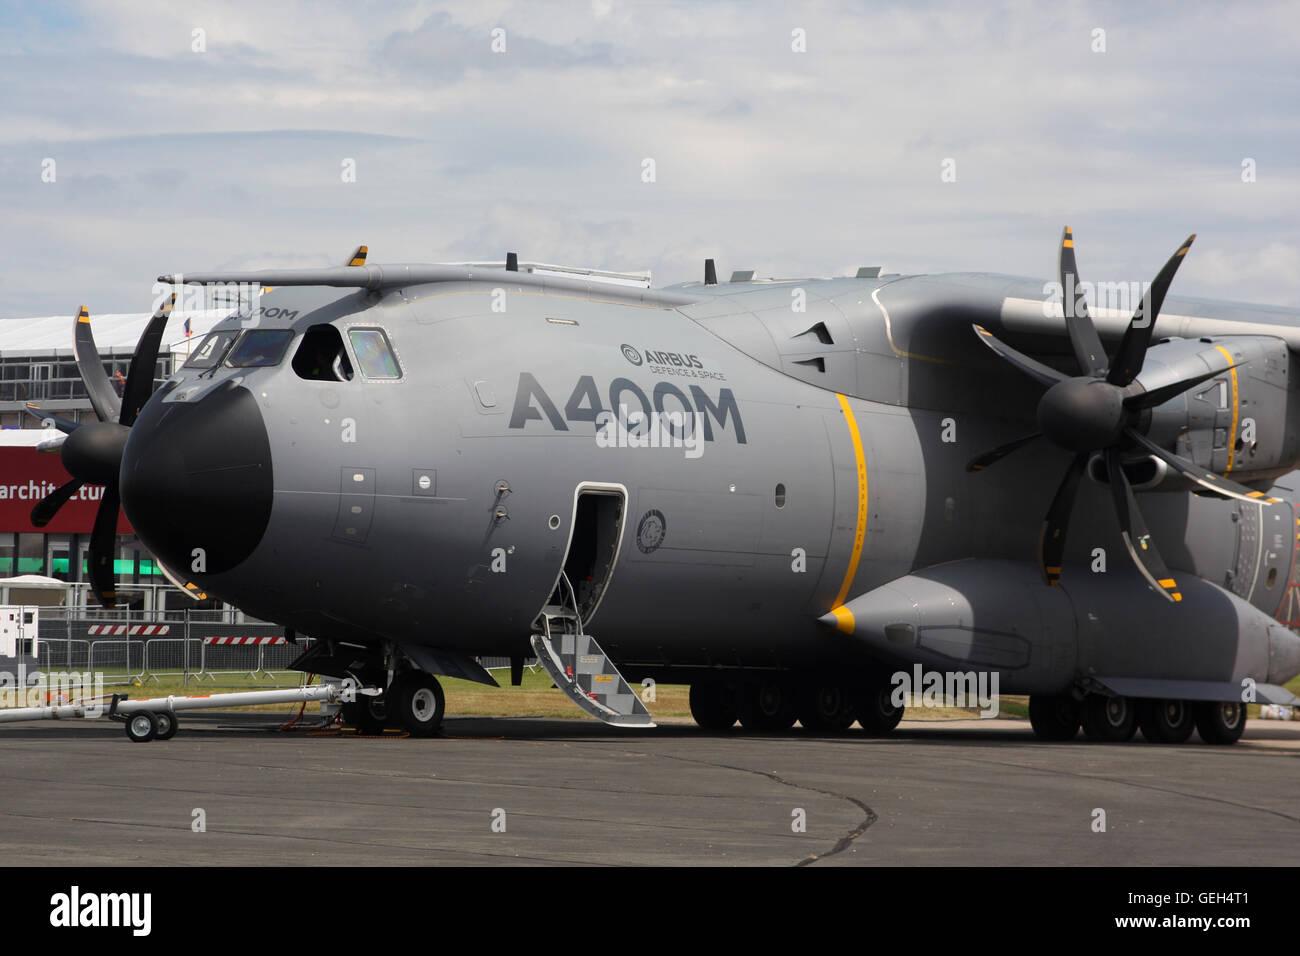 A400M - Stock Image